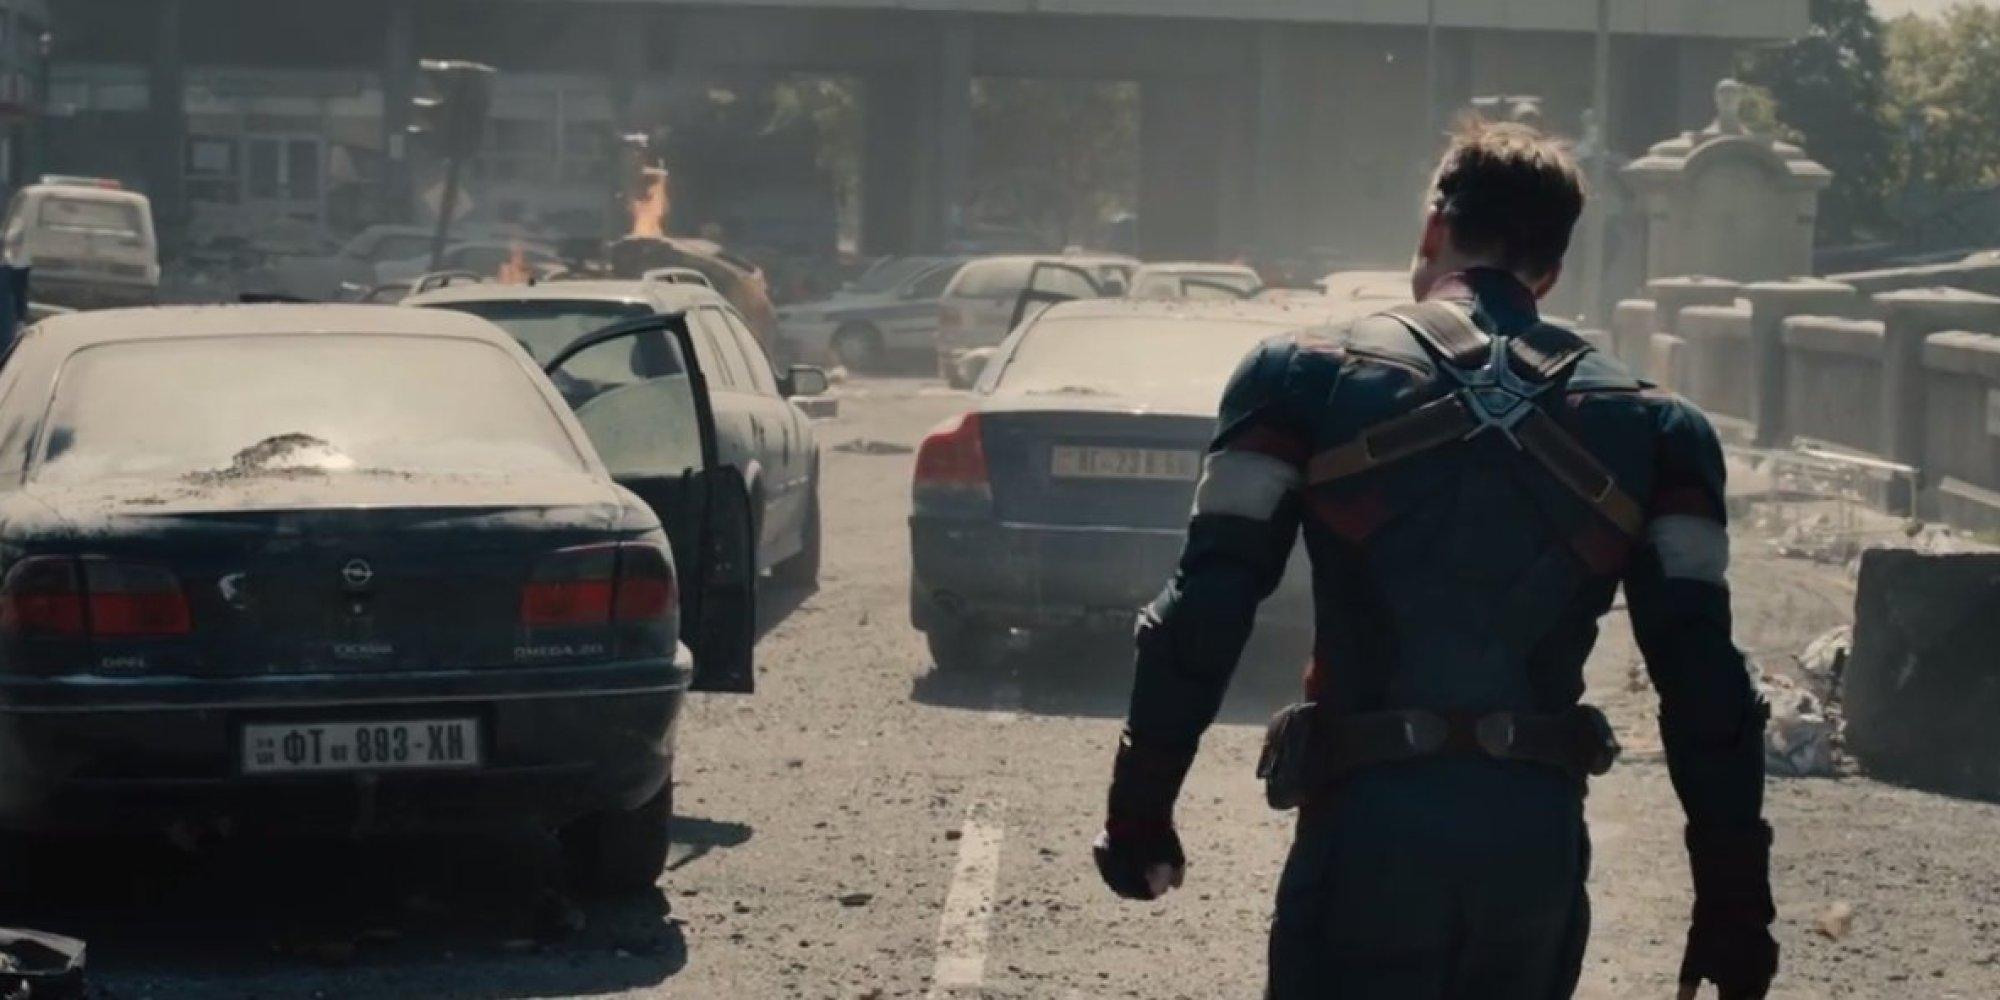 'Avengers: Age of Ultron' Comic-Con Teaser Leaks Online ...